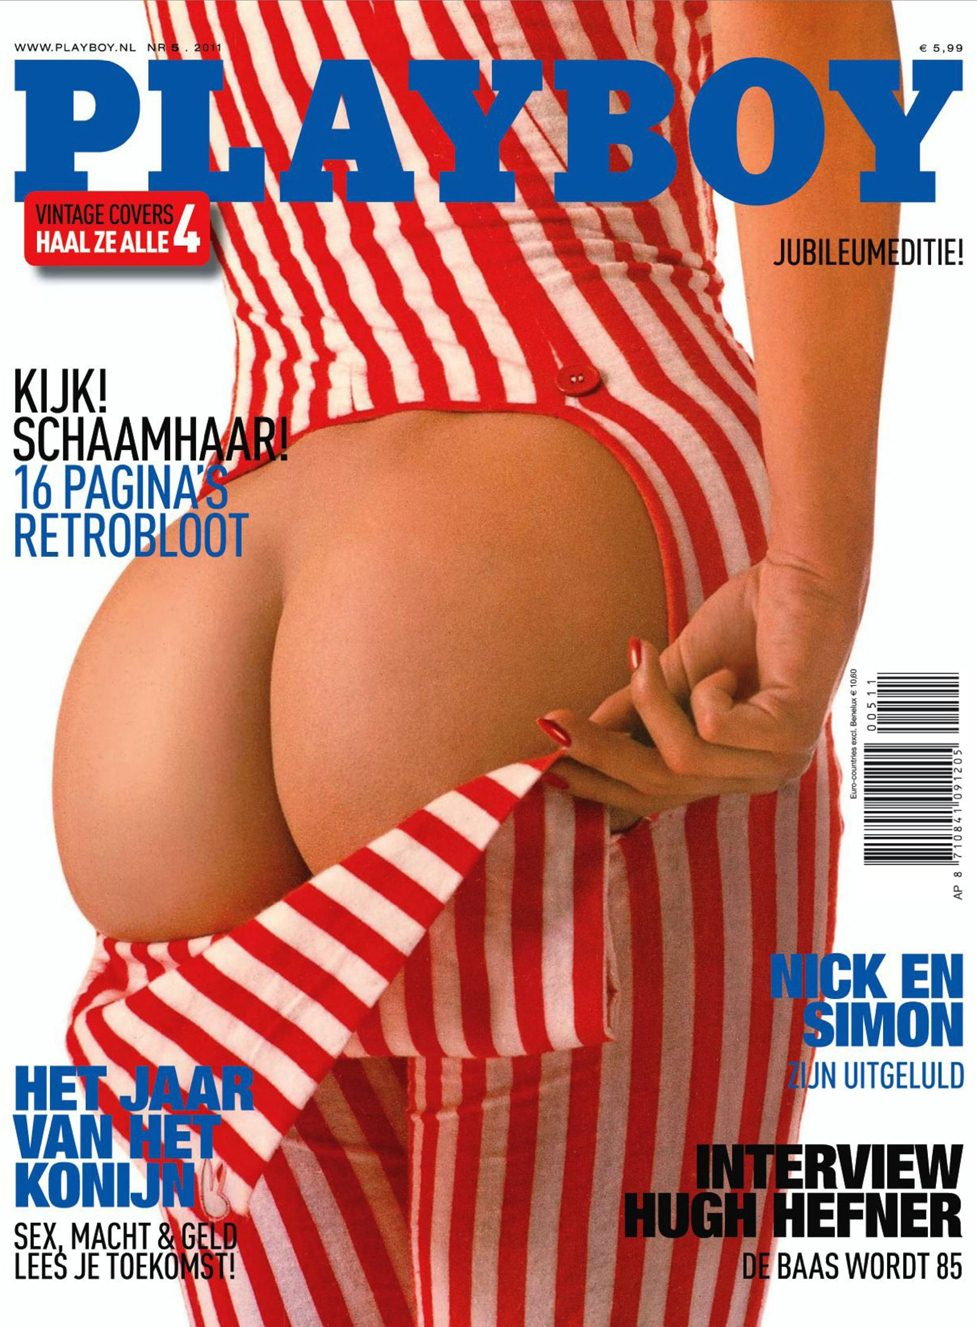 Playboy Netherlands may 2011